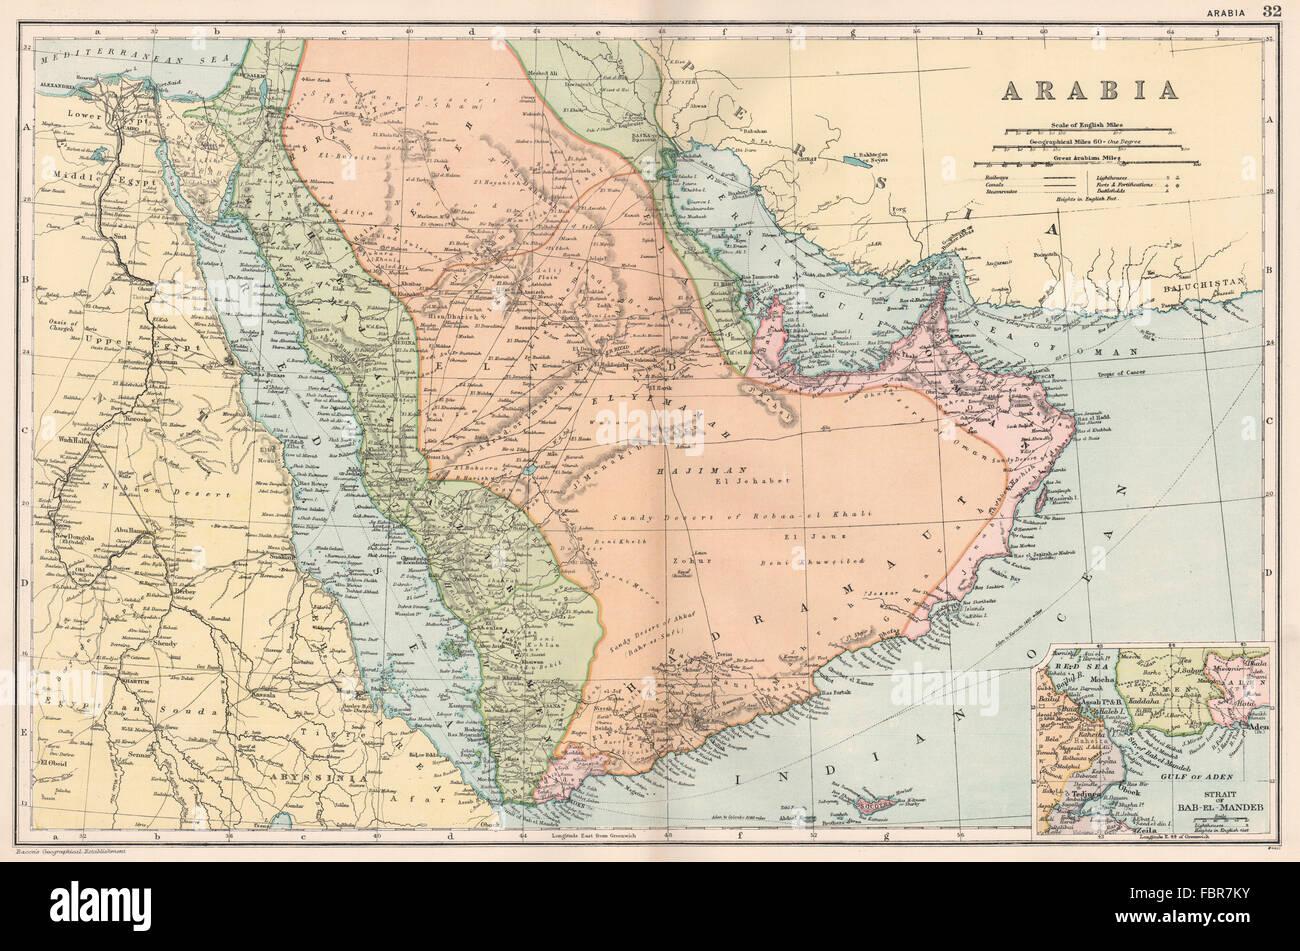 Saudi Arabia Map Maps Stock Photos & Saudi Arabia Map Maps ... on jordan map, kuwait map, sudan map, yemen map, philippines map, singapore map, morocco map, bahrain map, ksa map, iraq map, syria map, bangladesh map, oman map, south africa map, dubai map, germany map, soviet union map, china map, japan map, tunisia map,